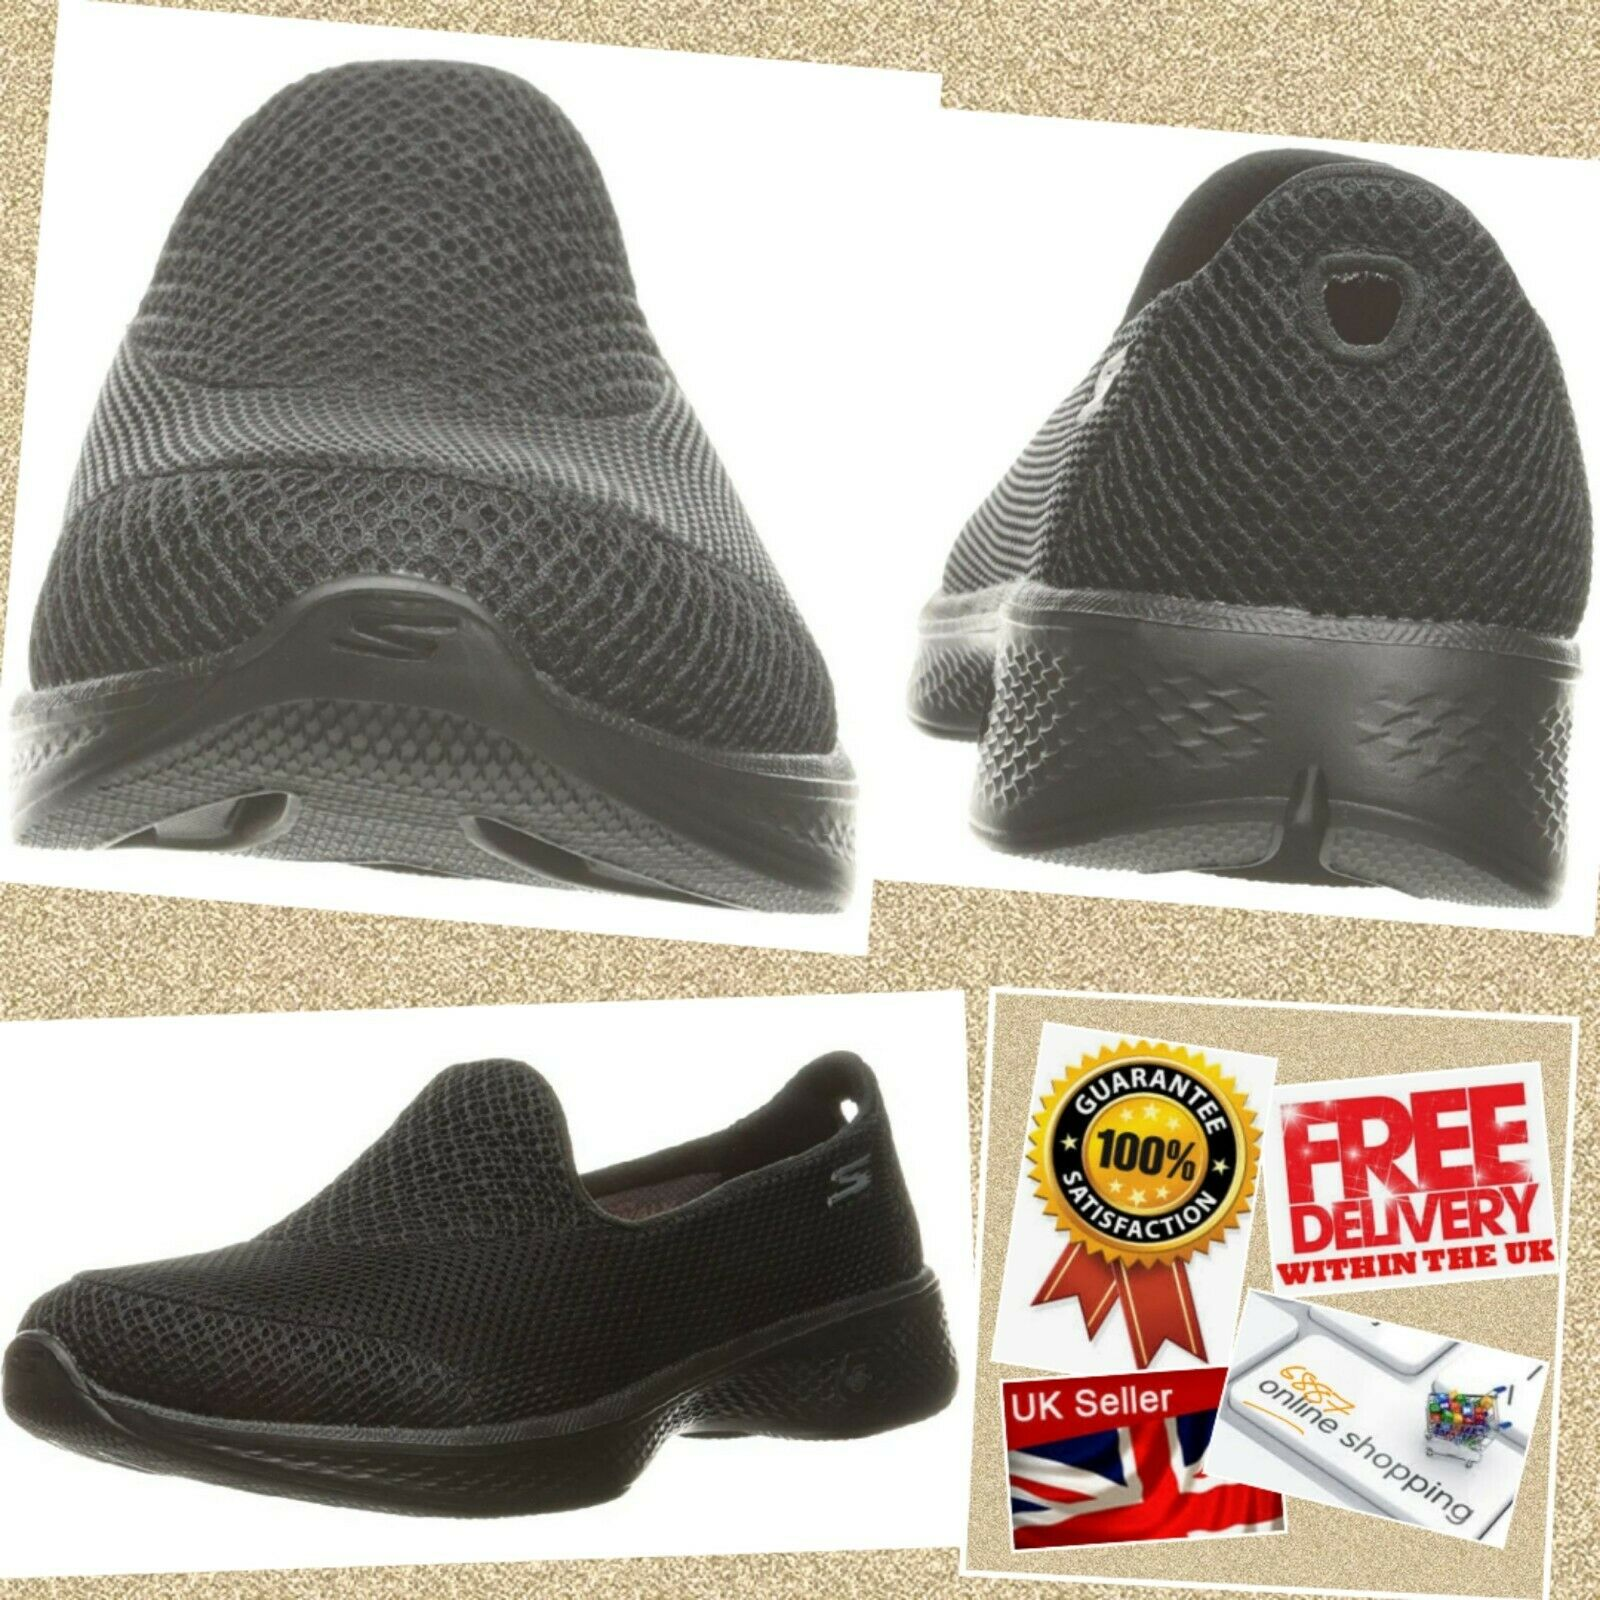 LADIES SKECHERS PROPEL GO WALK 4 schwarz SLIP ON WALKING schuhe TRAINERS 14170 UK 6